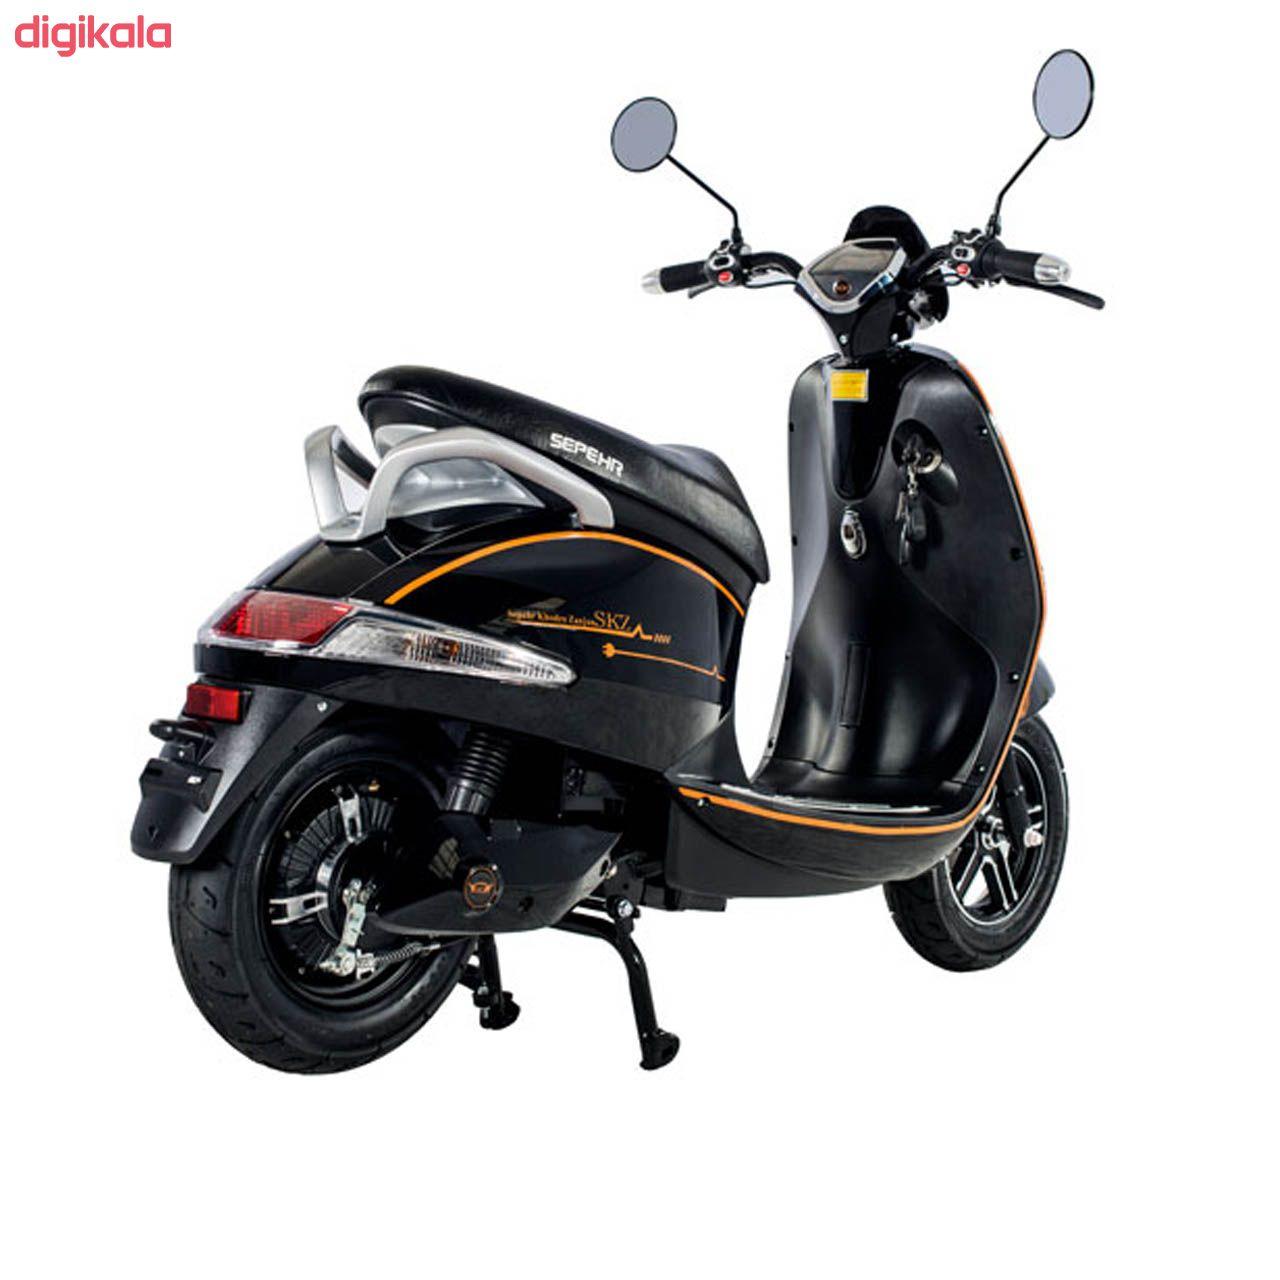 موتورسیکلت سپهر مدل 1600SKZ وات سال 1399 main 1 6